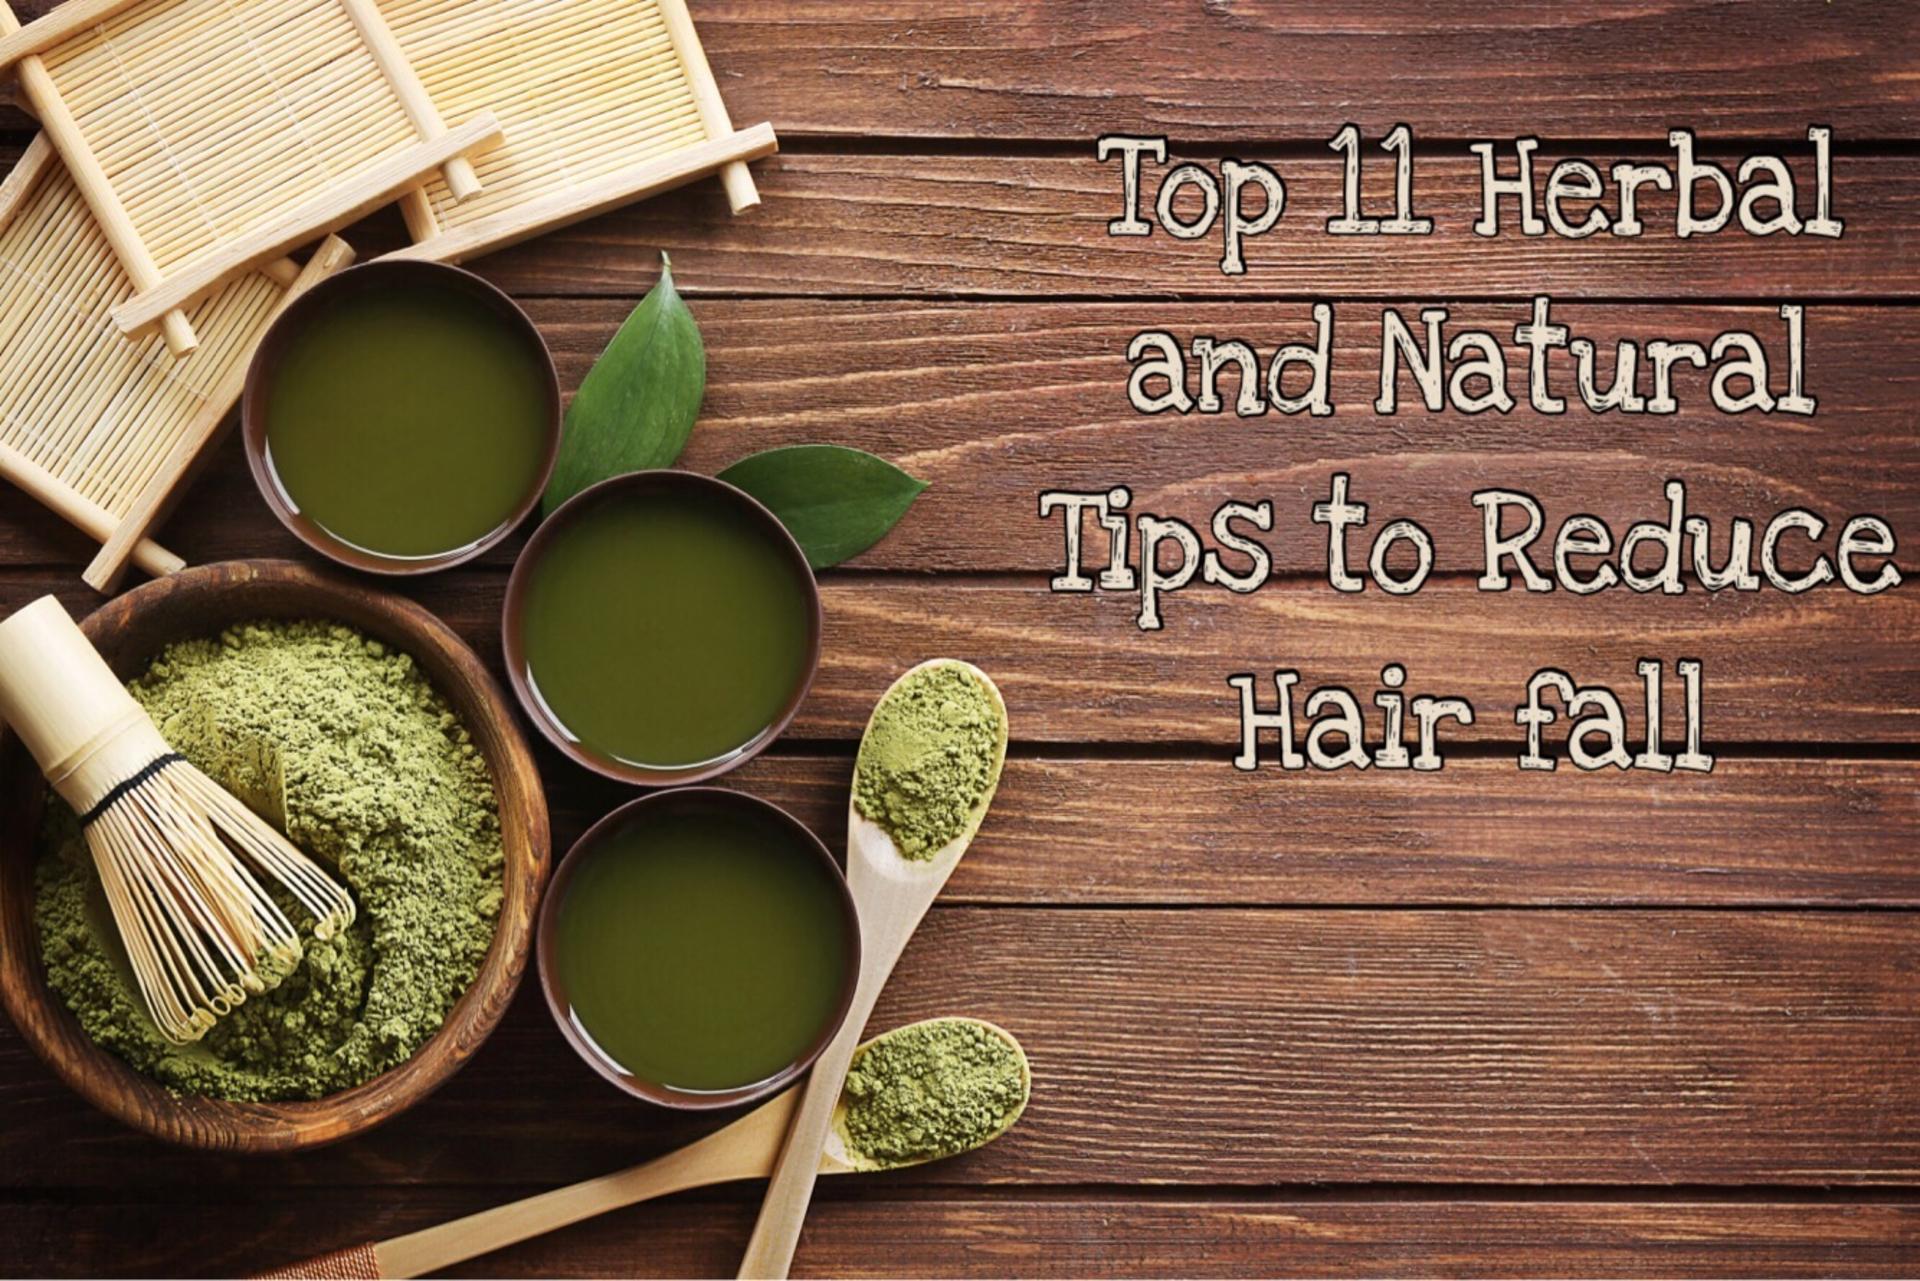 Natural Tips To Reduce Hairfall image